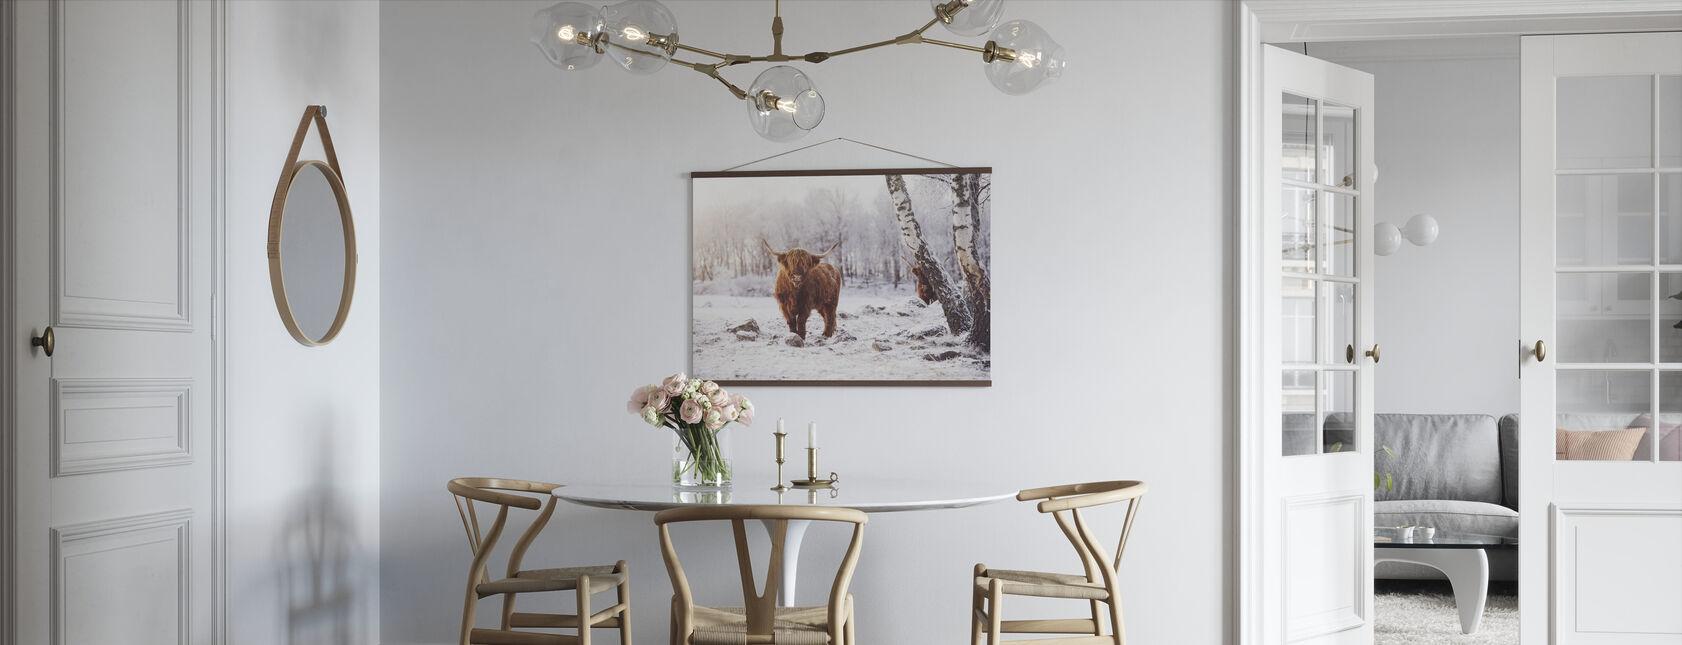 Highland Cattle - Poster - Kitchen